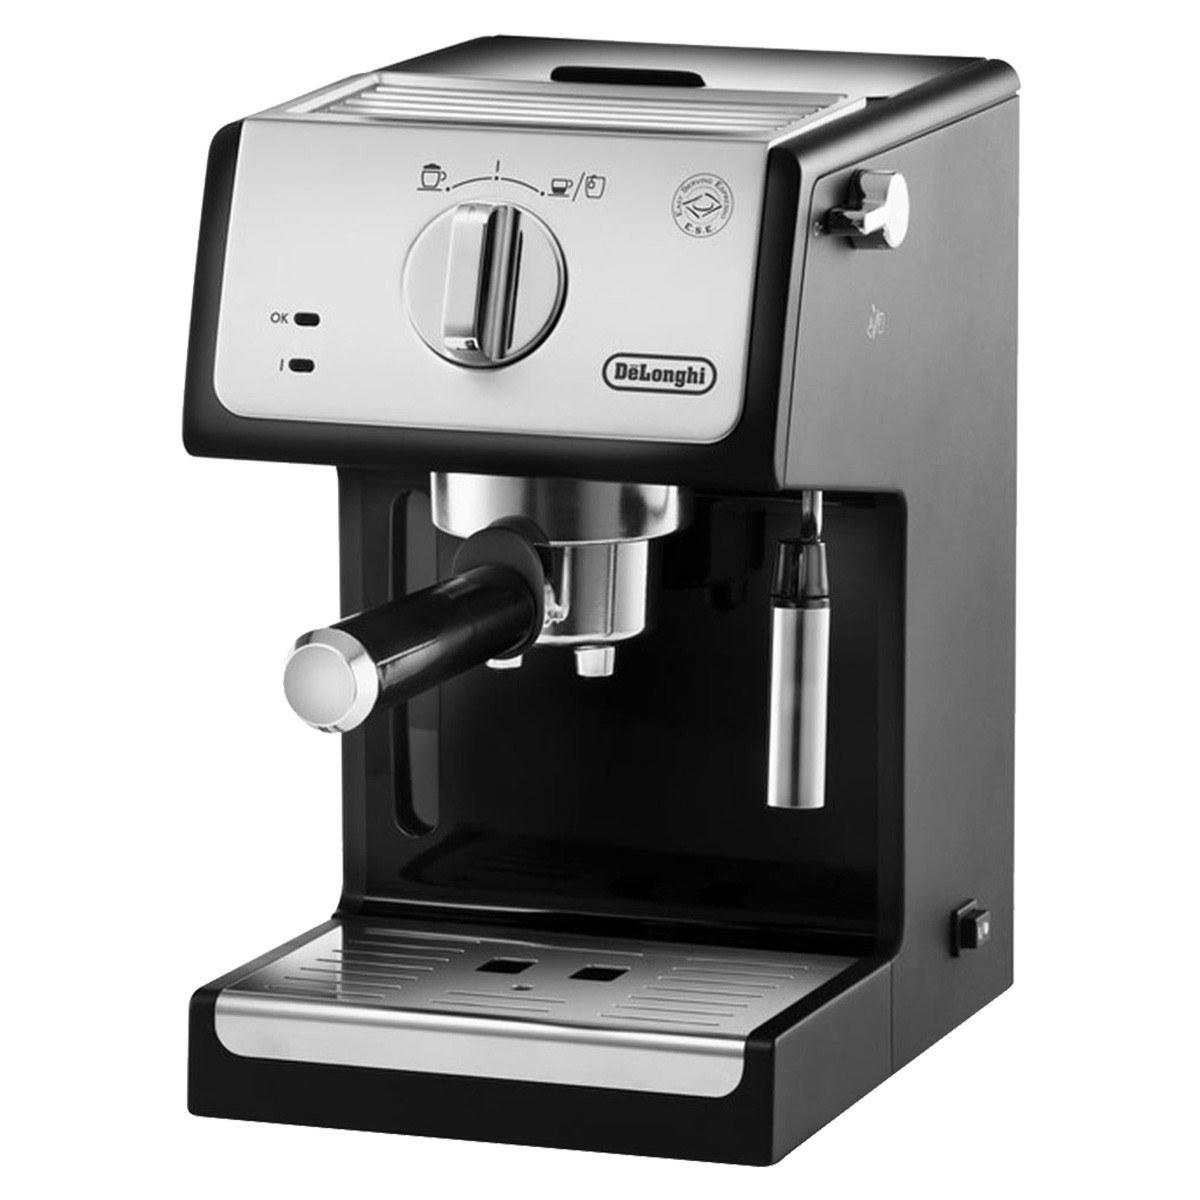 عکس قهوه ساز و اسپرسو ساز  دلونگی ECP 33.21 قهوه-ساز-و-اسپرسو-ساز-دلونگی